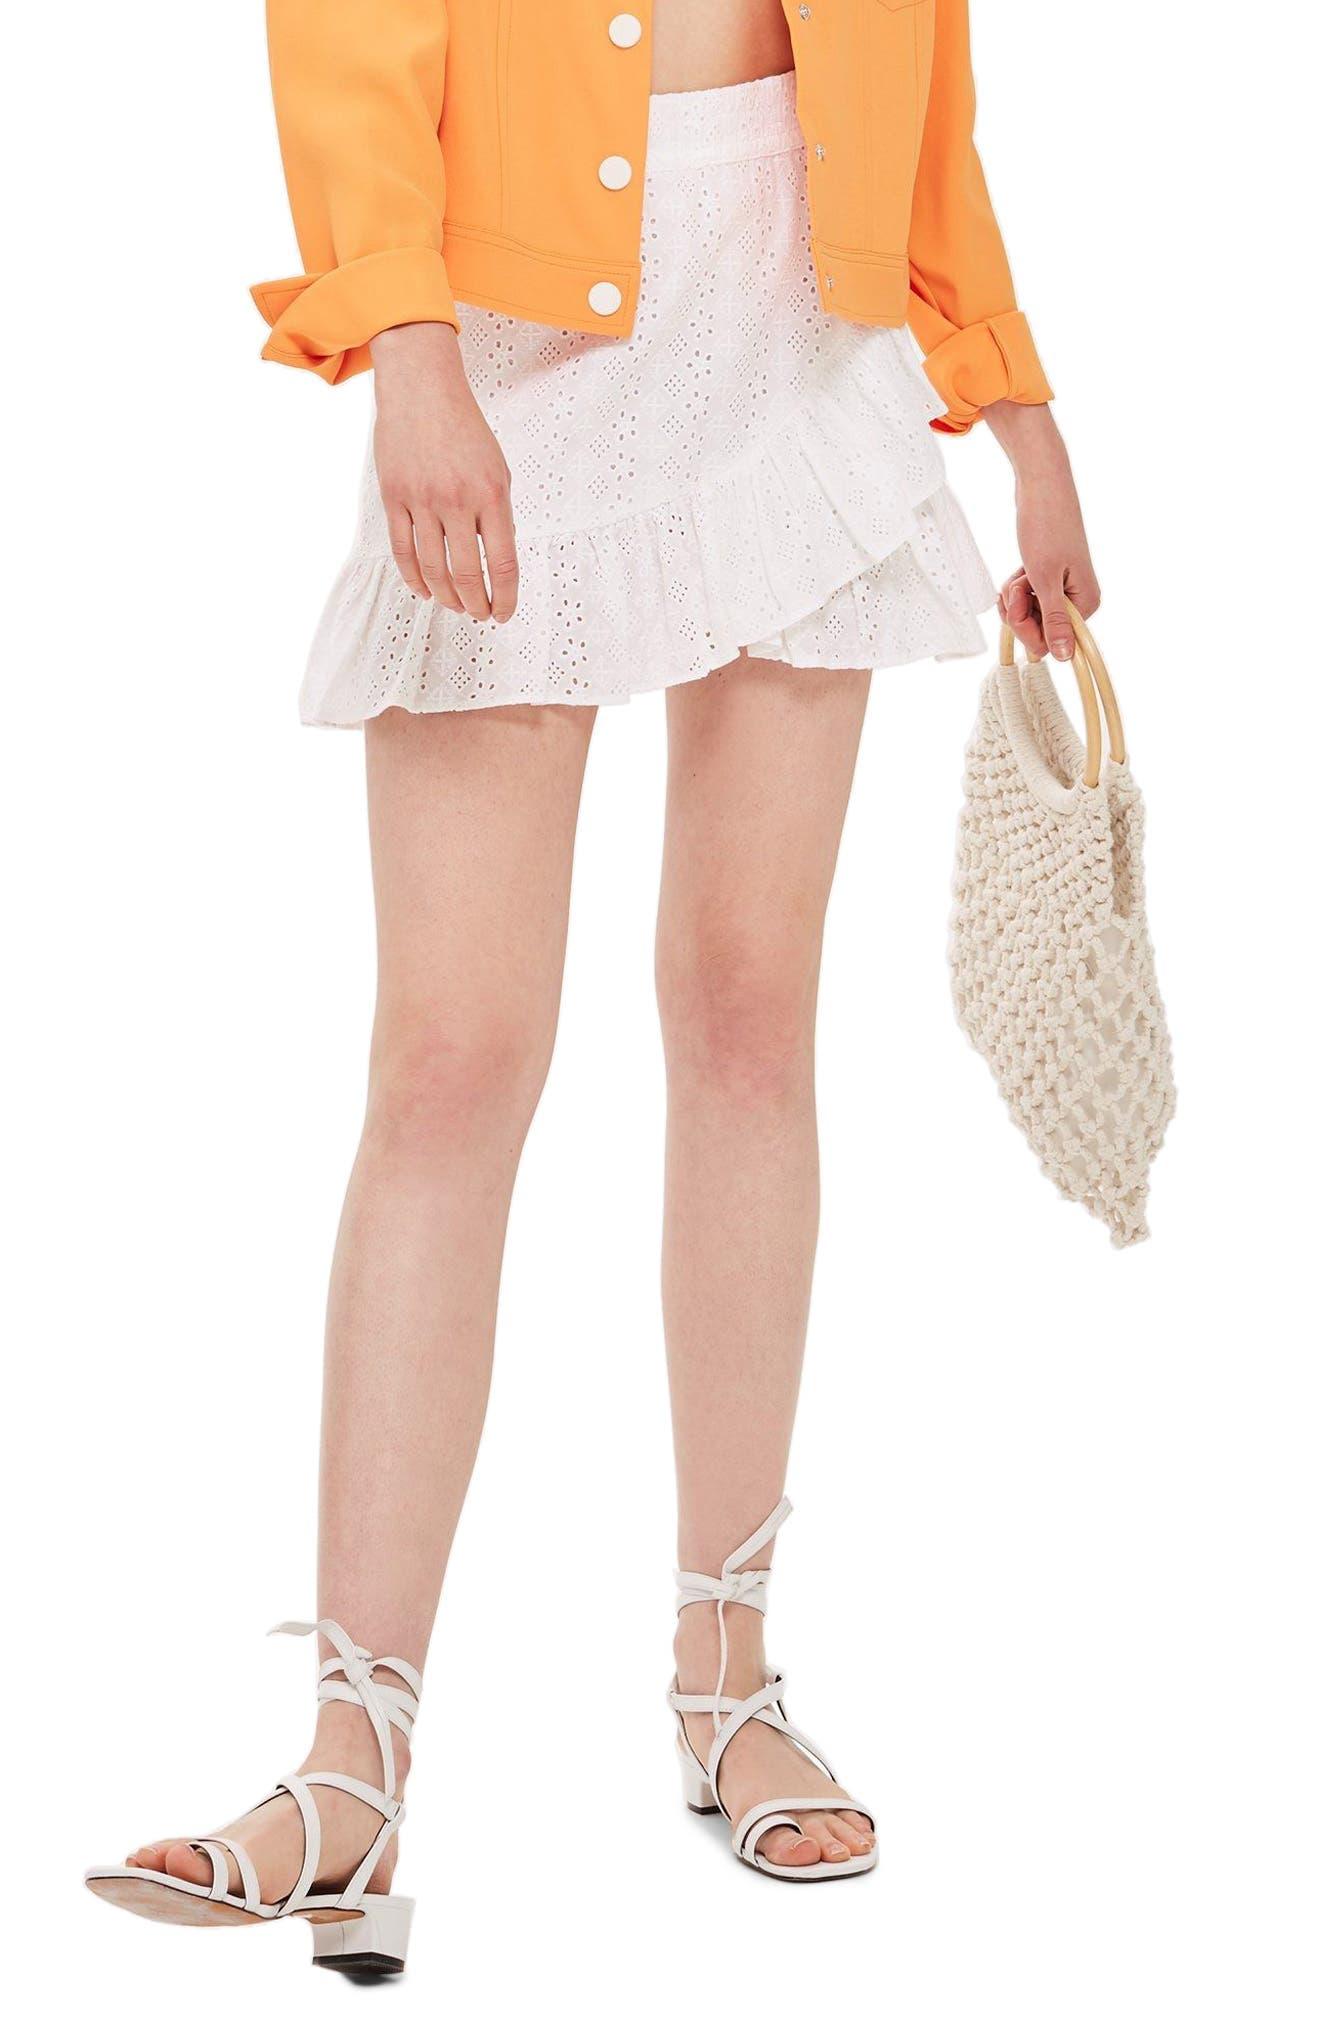 Topshop Broderie Ruffle Miniskirt, US (fits like 10-12) - White